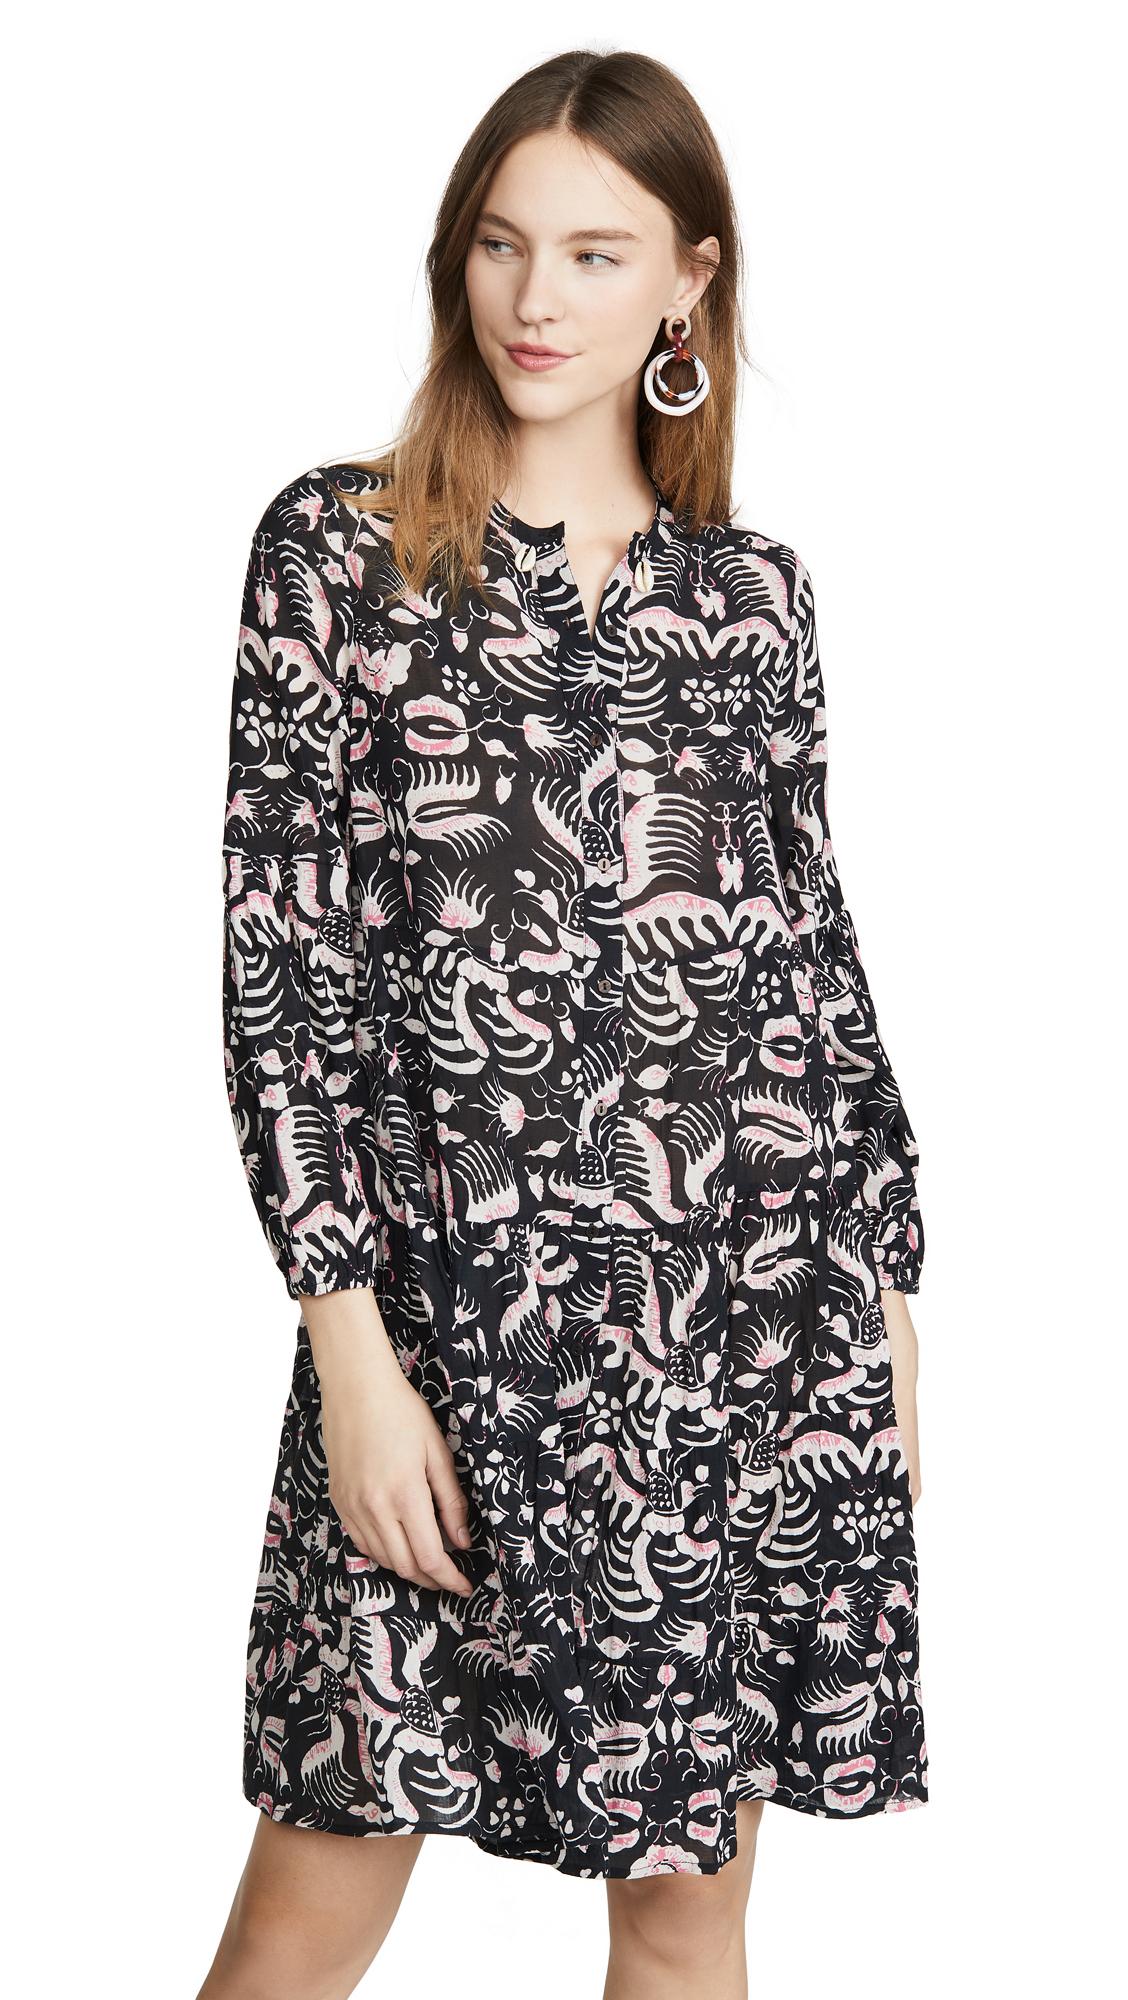 Figue Xiomara Short Dress - 50% Off Sale